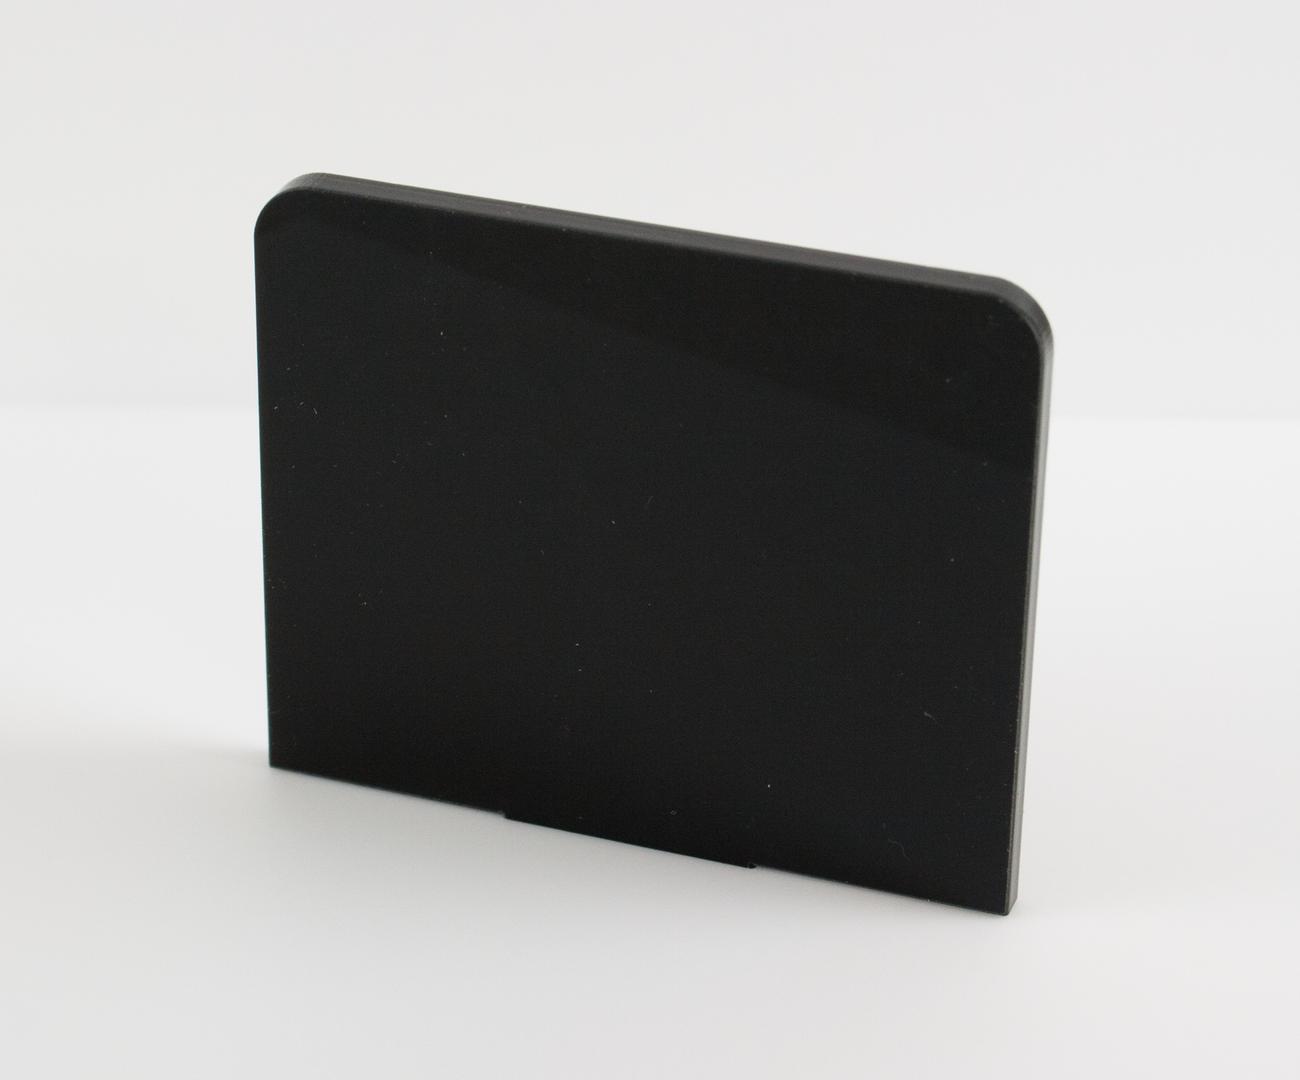 Infrared Transmitting Black Acrylic Southern Acrylics